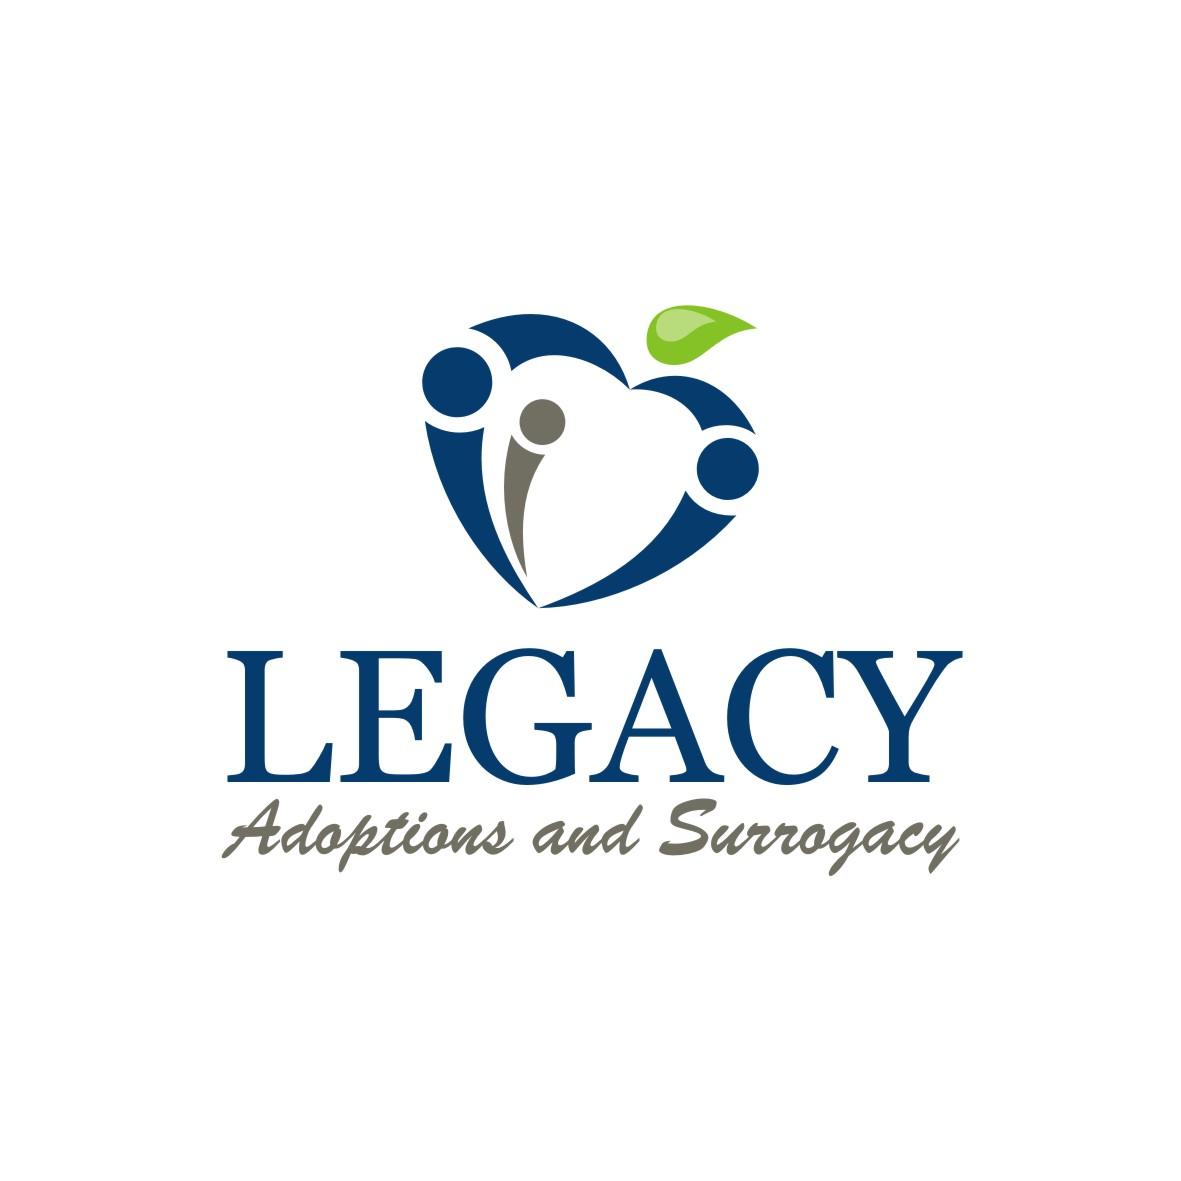 Logo Design by arteo_design - Entry No. 111 in the Logo Design Contest Legacy Adoptions and Surrogacy Logo Design.